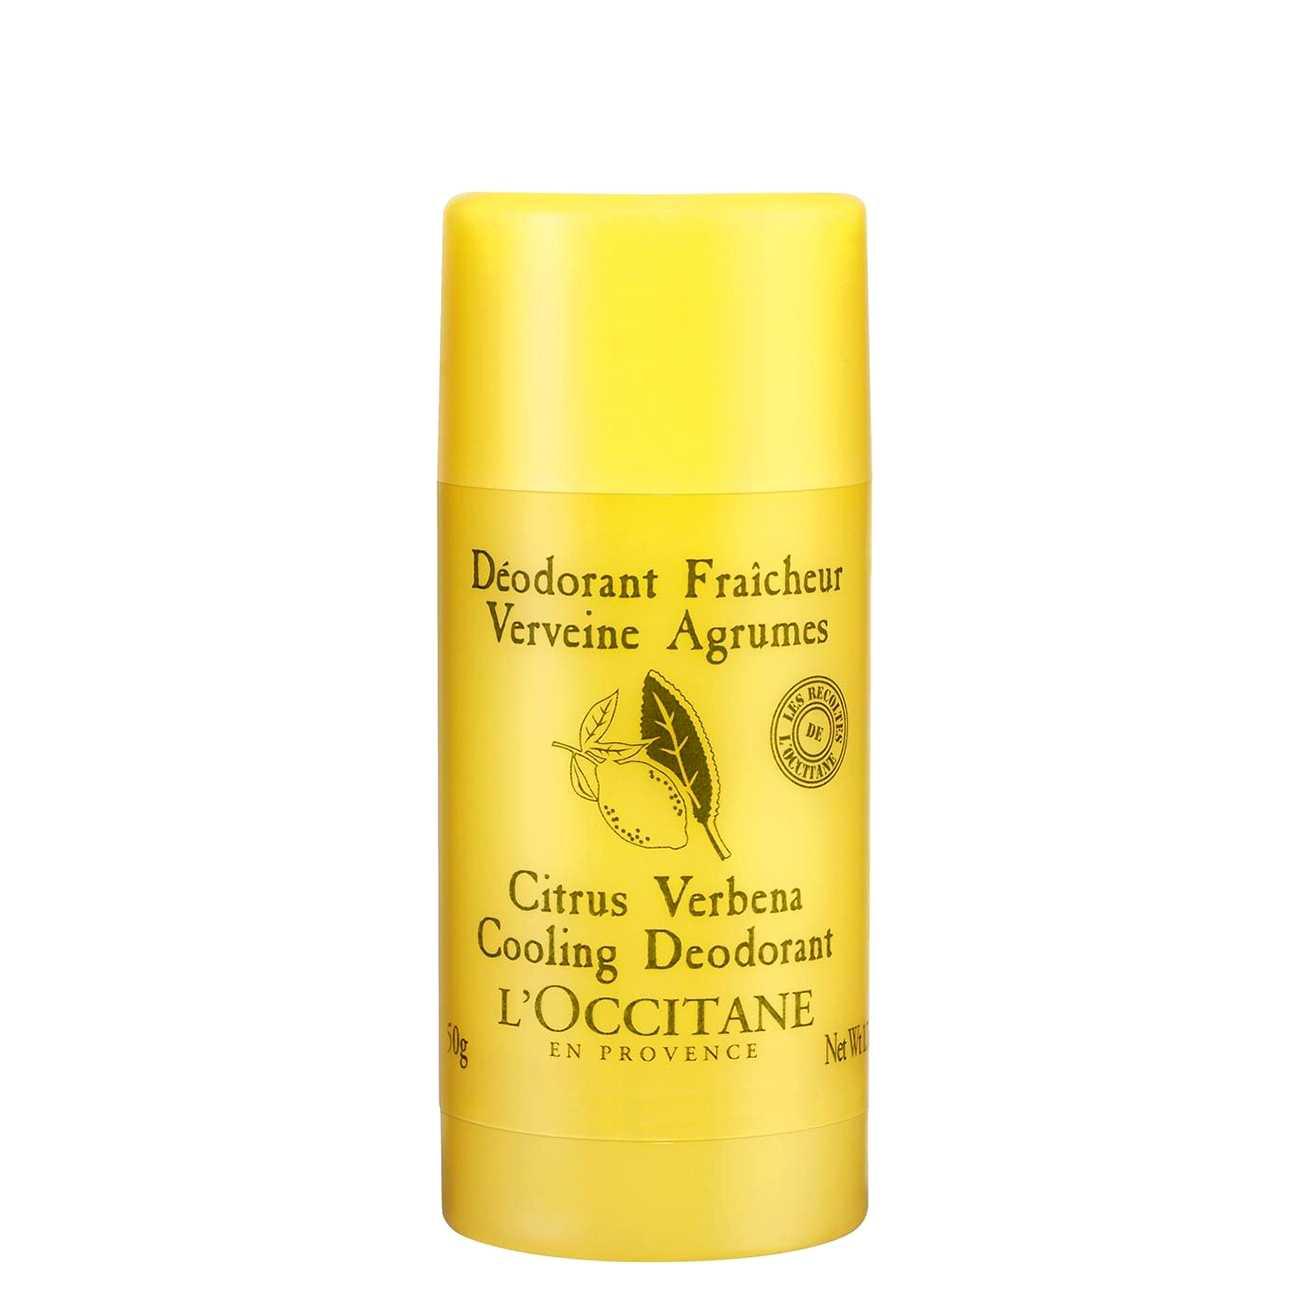 Citrus Verbena Cooling Deodorant 50 G L'occitane imagine 2021 bestvalue.eu